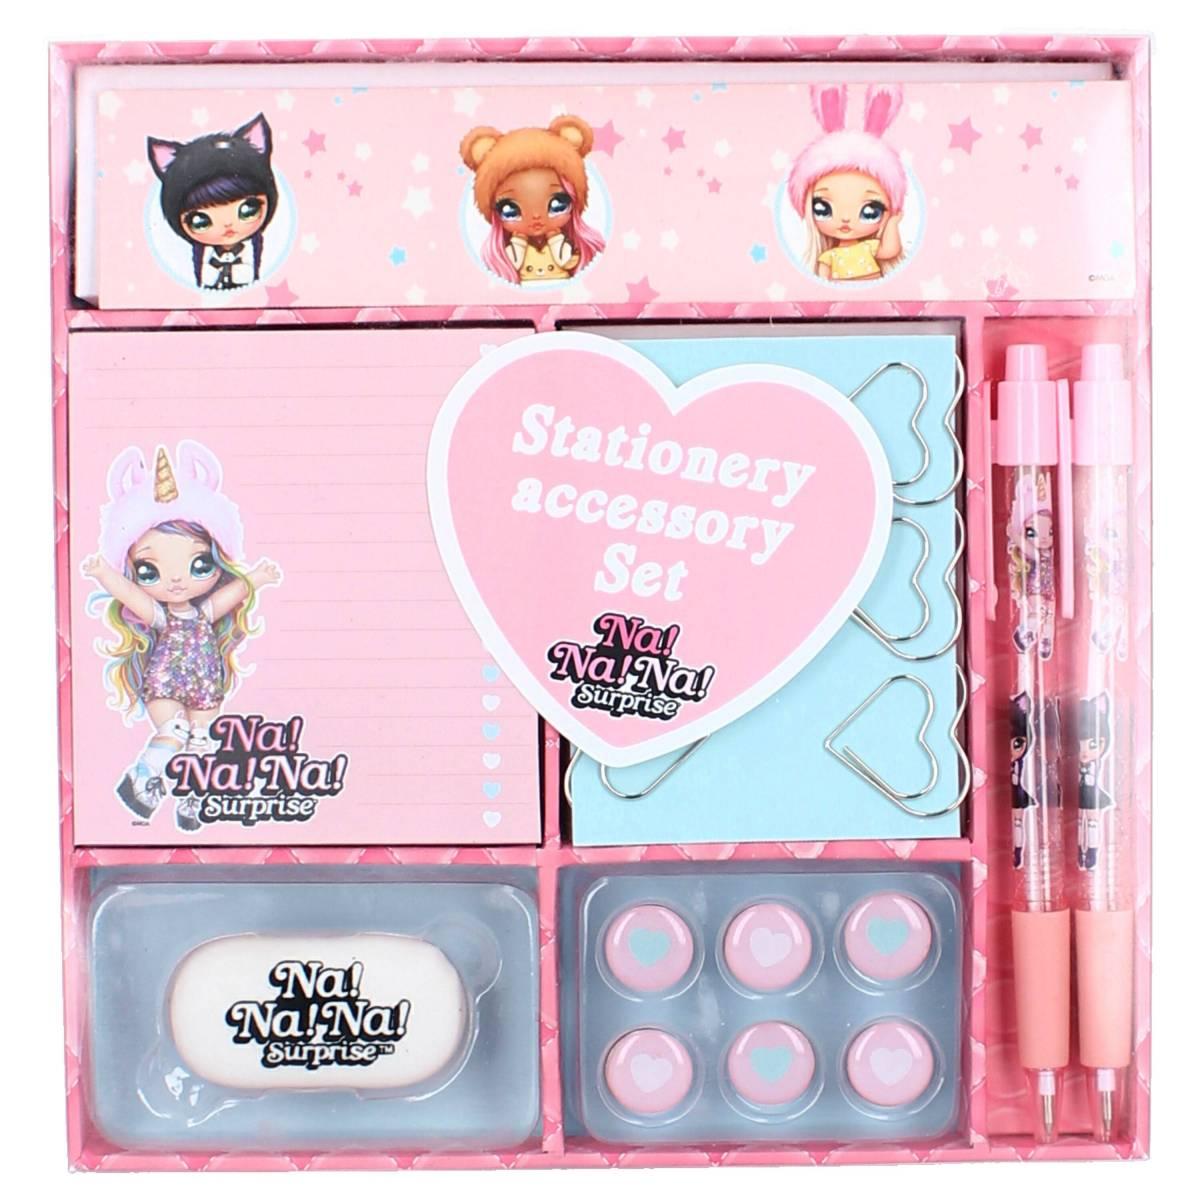 Stationery set Na!Na!Na! surprise - chic stationery